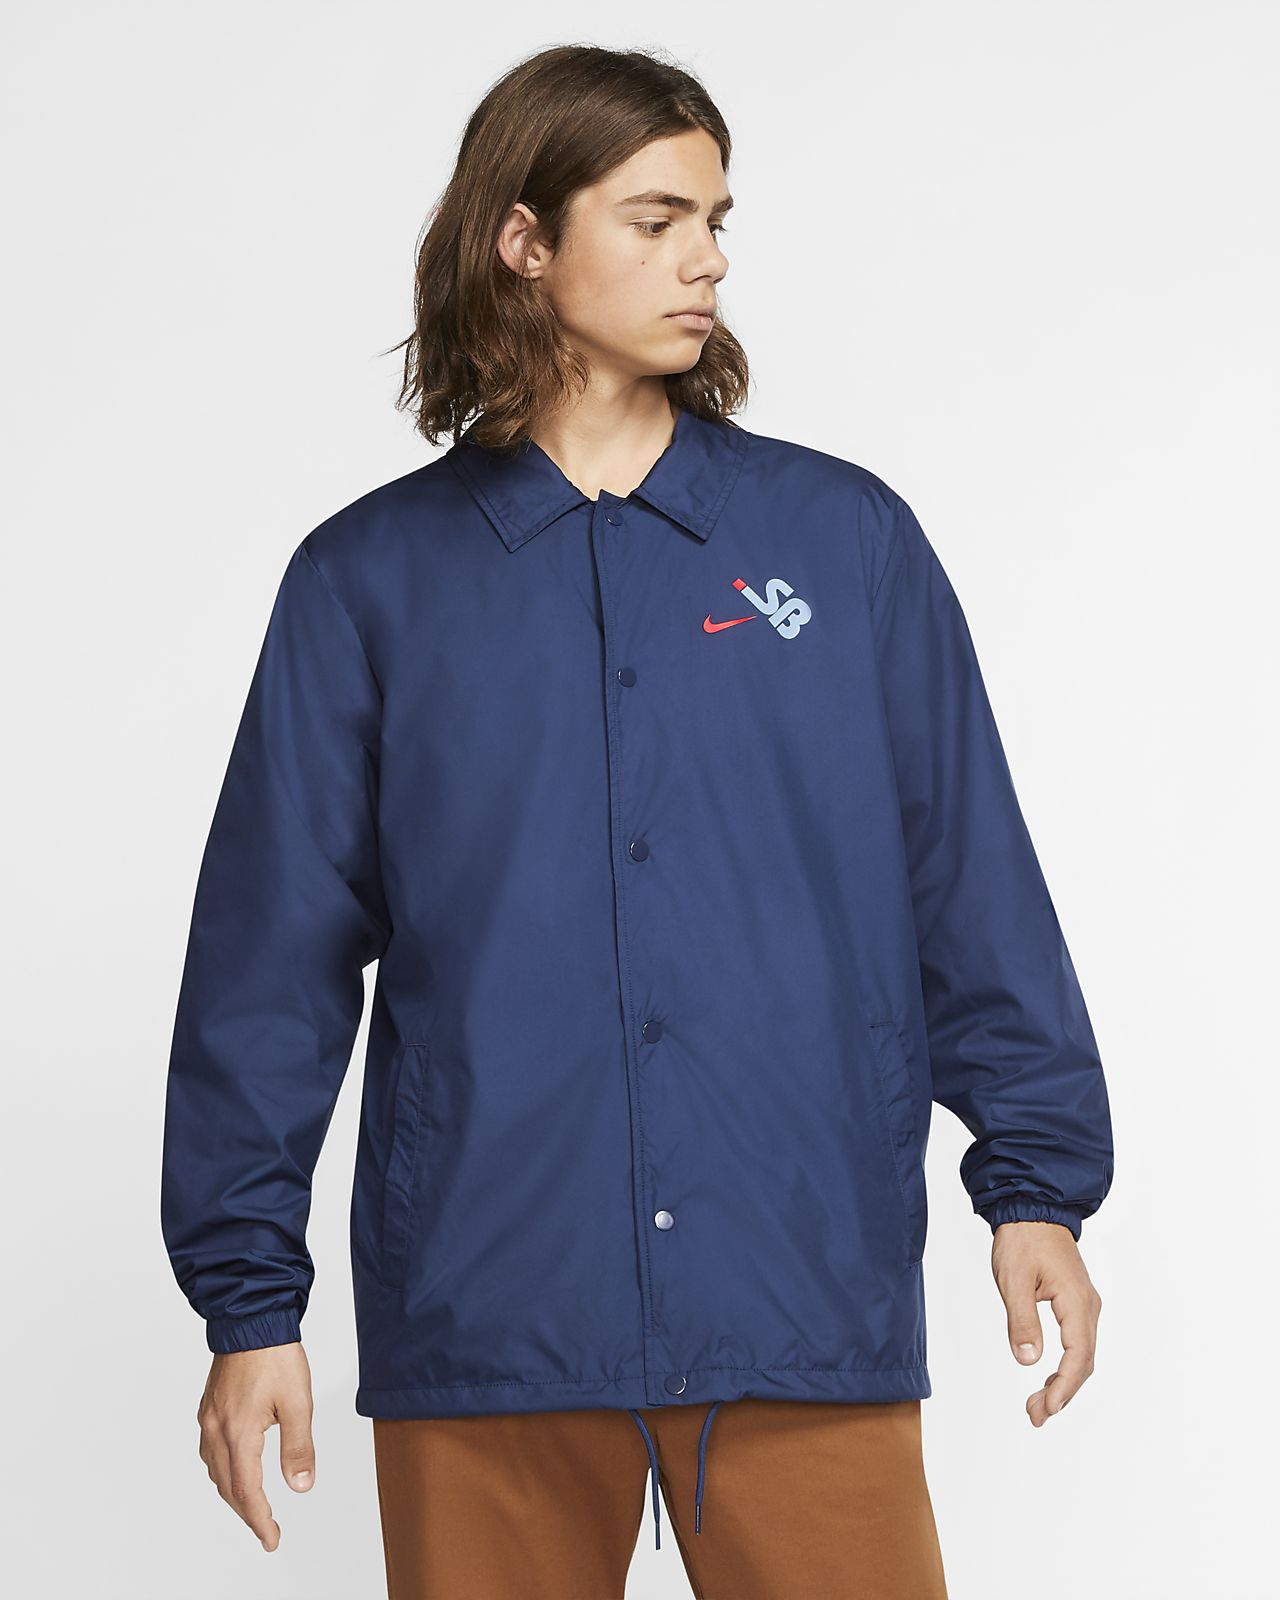 Nike SB Erkek Kaykay Ceketi